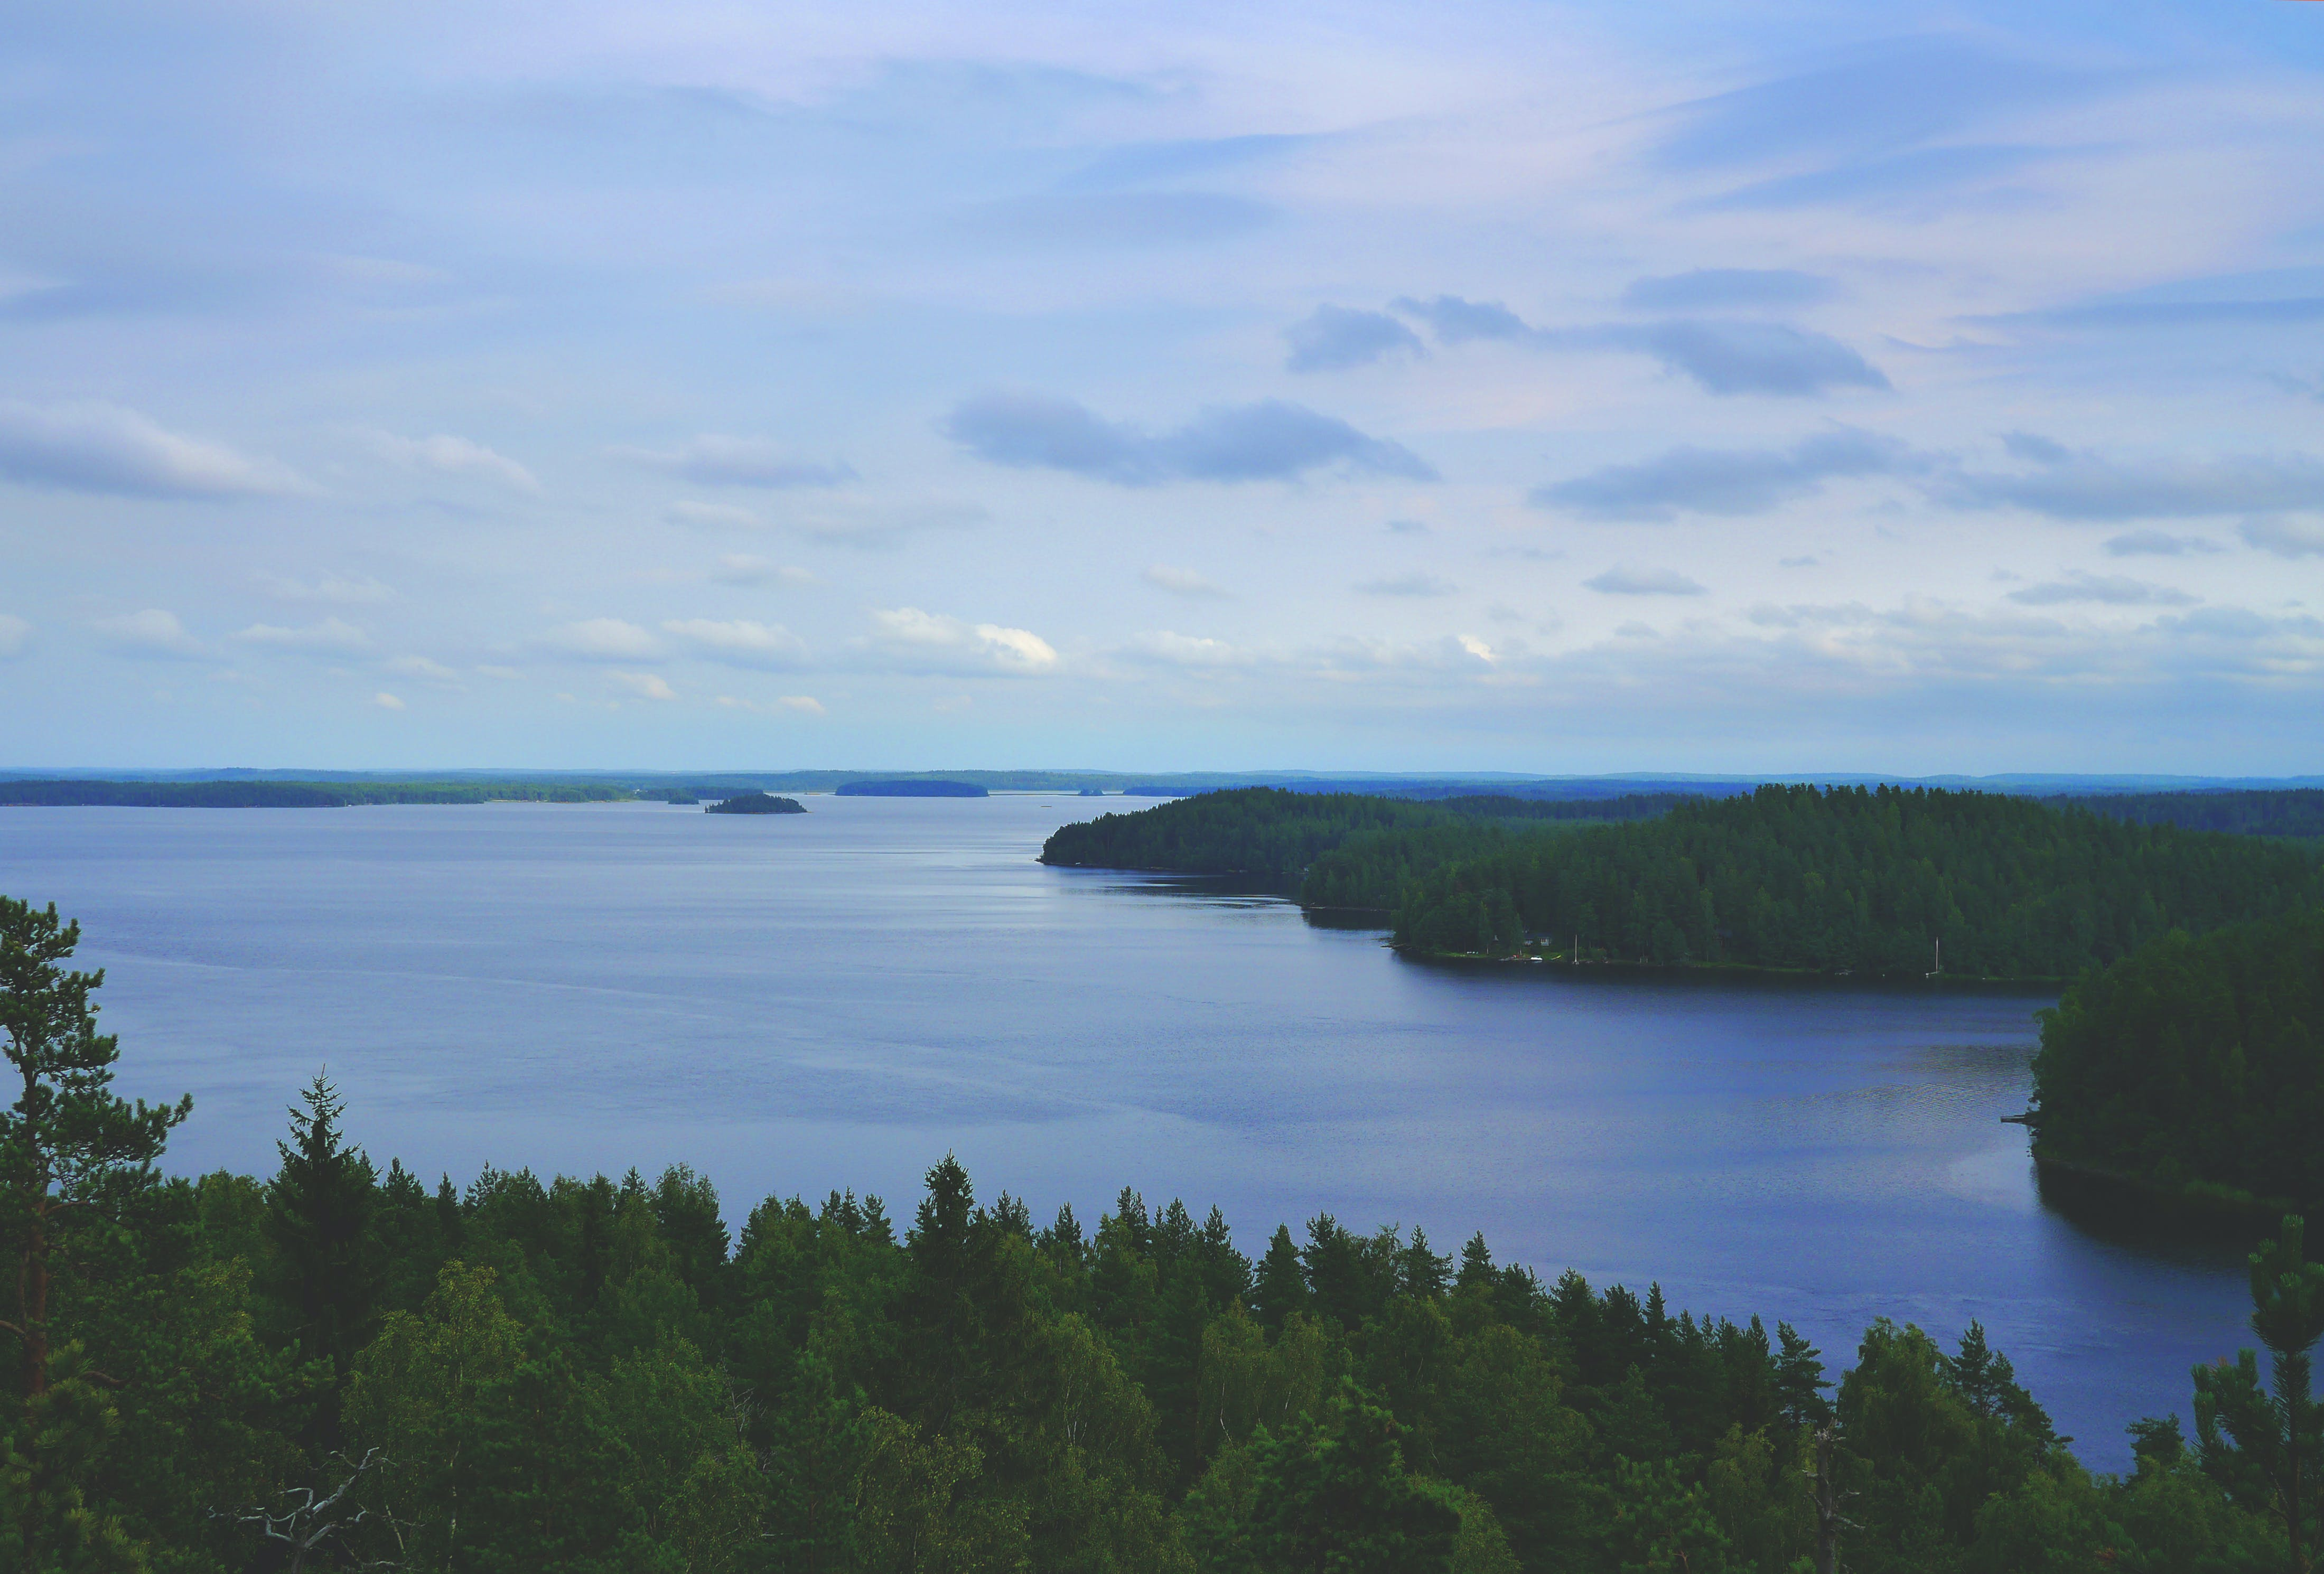 Fotos de stock gratuitas de agua, arboles, bosque, cielo